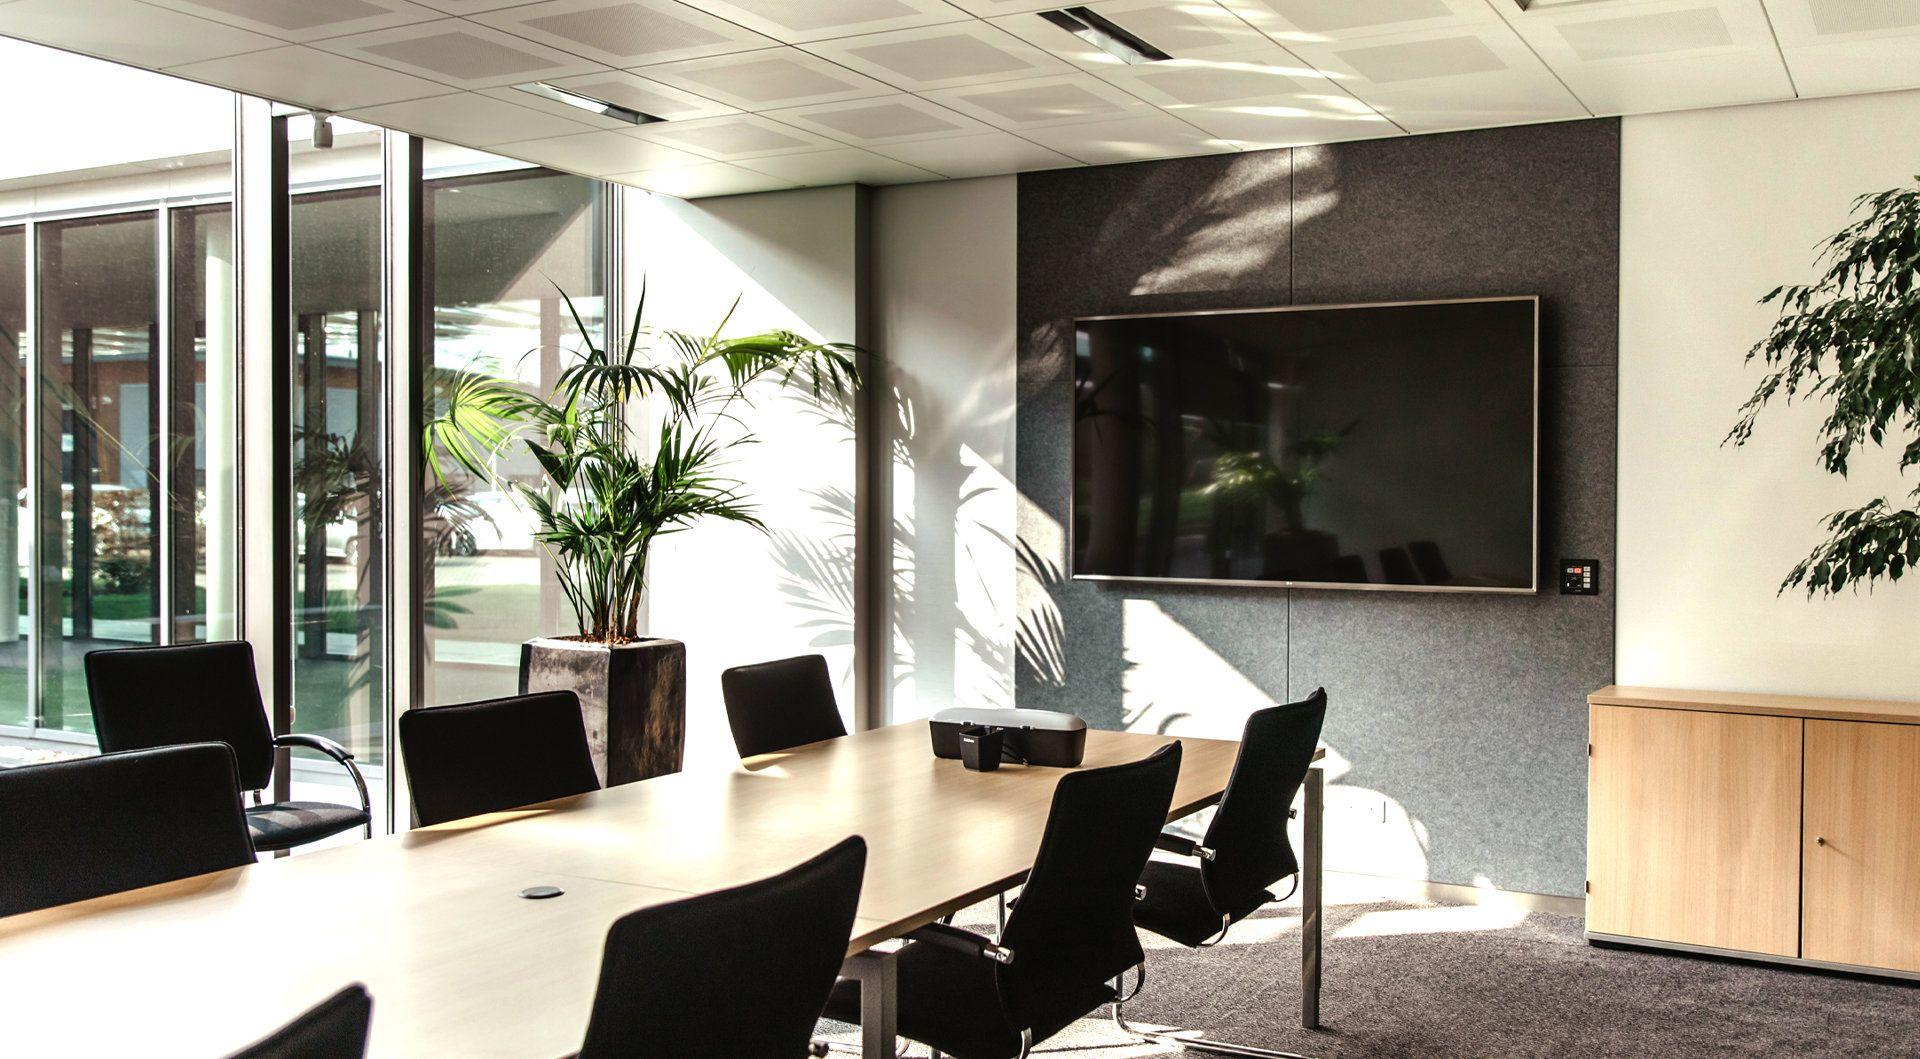 "iiyama ProLite X2888HS-B2 computer monitor 71,1 cm (28"") 1920 x 1080 Pixels Full HD LED Zwart - Case studie de vries"